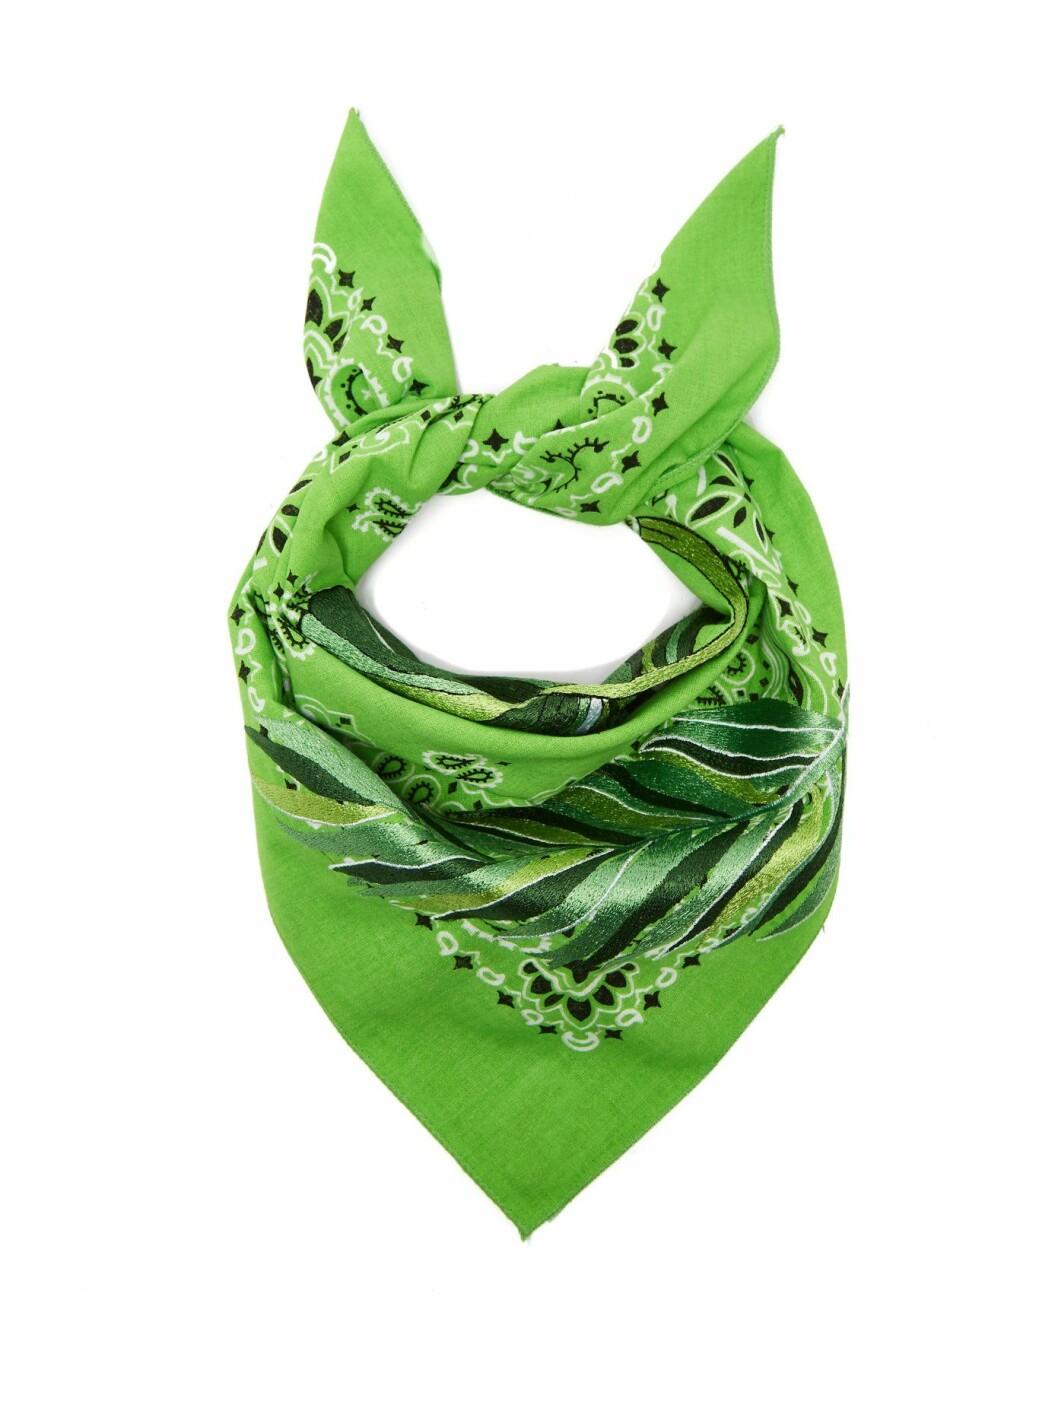 Skjerf fra Kilometre Paris |1395,-| https://www.matchesfashion.com/intl/products/Kilometre-Paris-India-embroidered-cotton-bandana-scarf-1261042